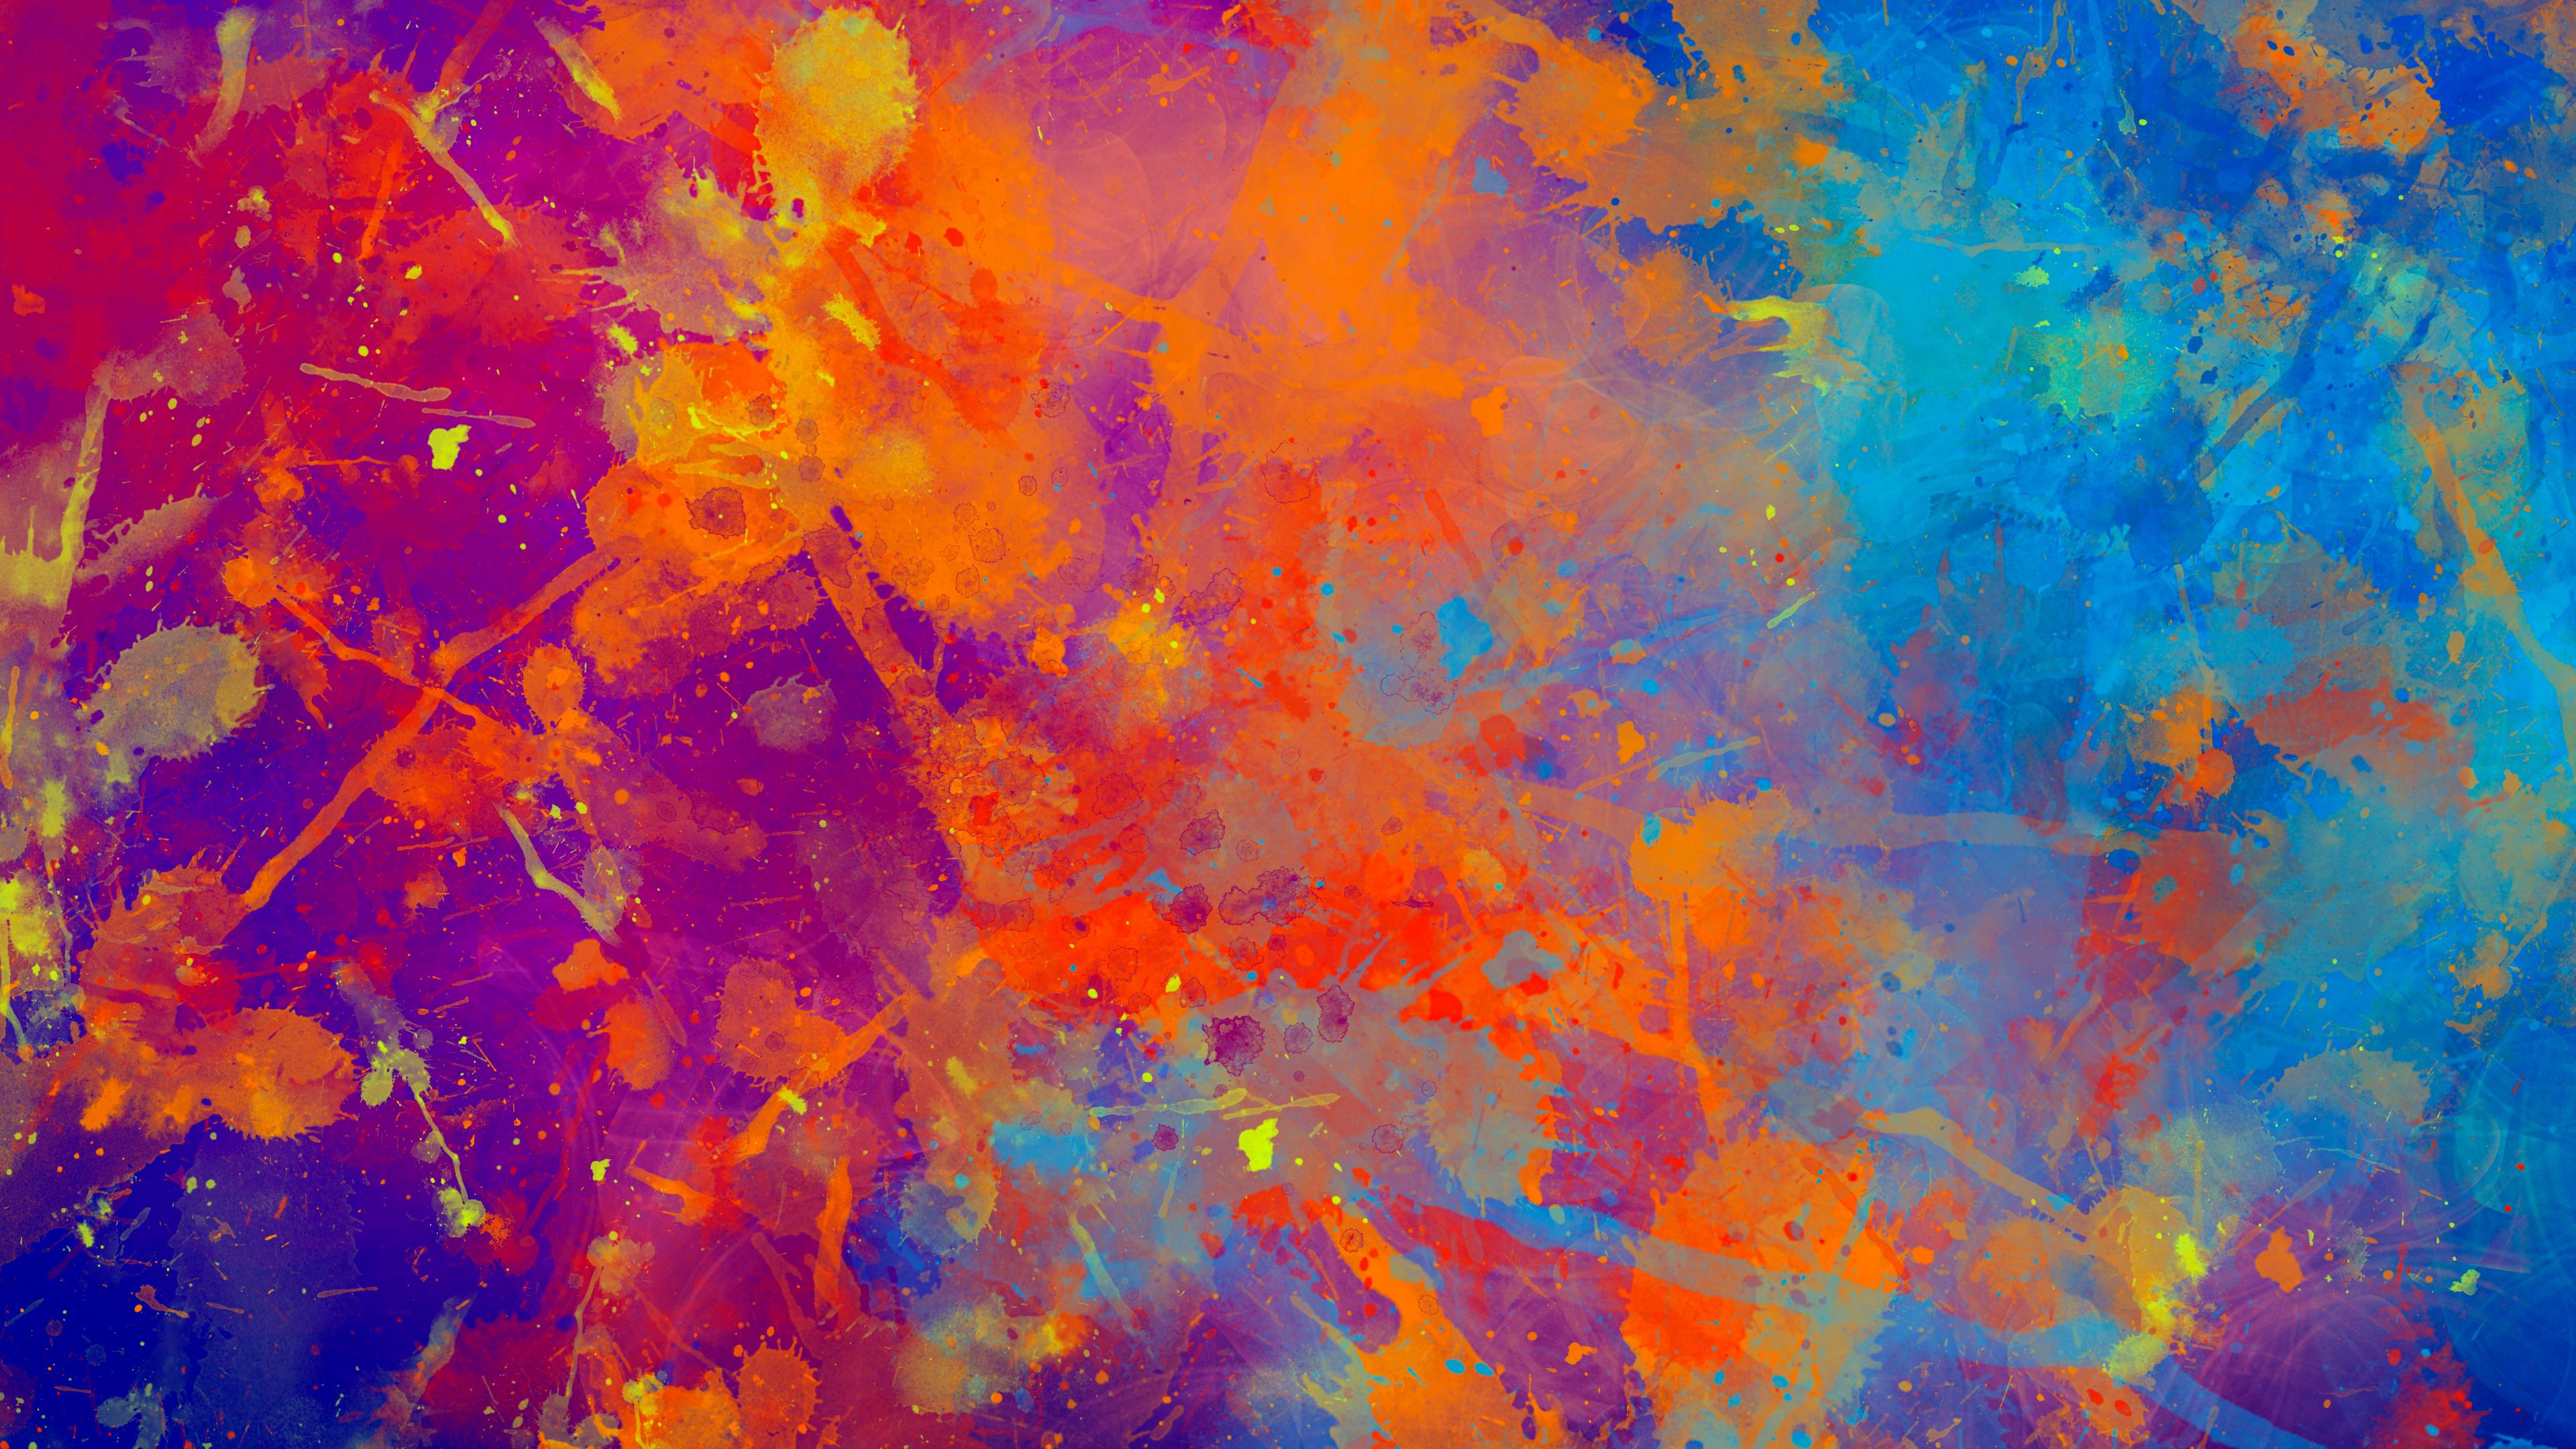 paint splash abstract 1575661246 - Paint Splash Abstract -